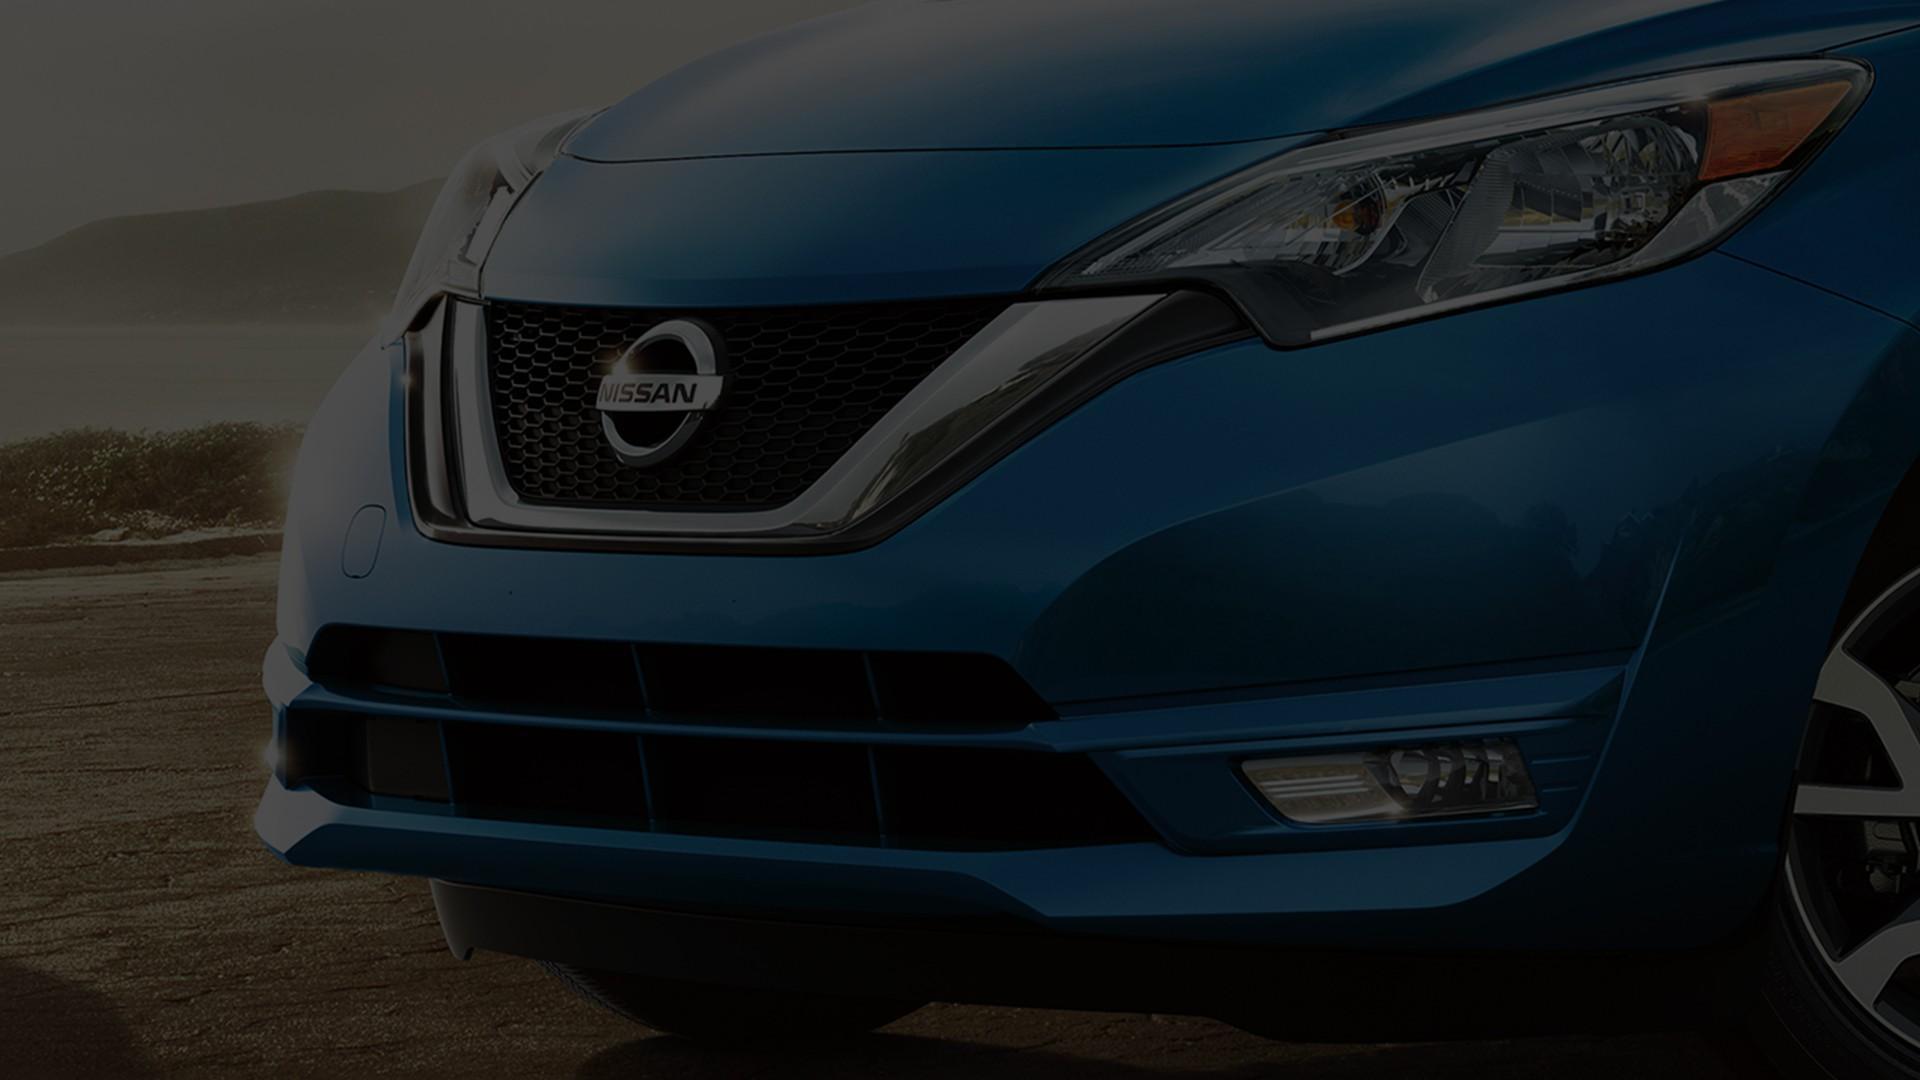 New Nissan Blue